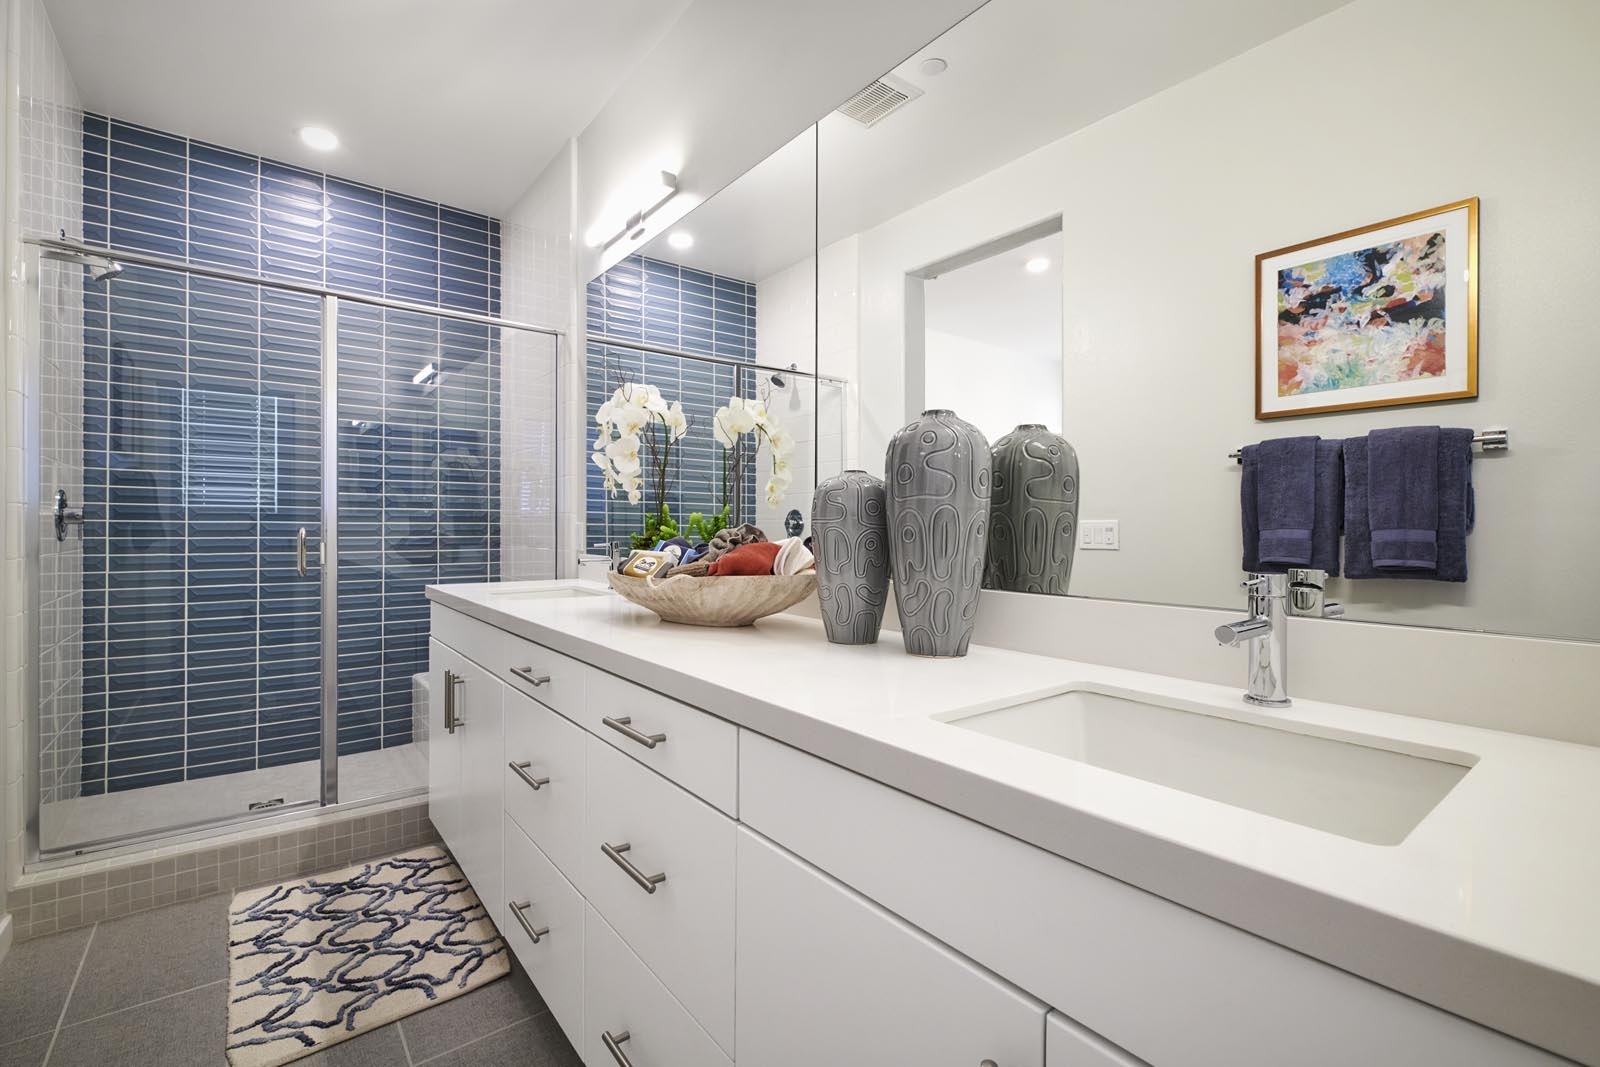 Master Bathroom | Residence 1 | Enliven | New Homes in Rancho Cucamonga, CA | Van Daele Homes